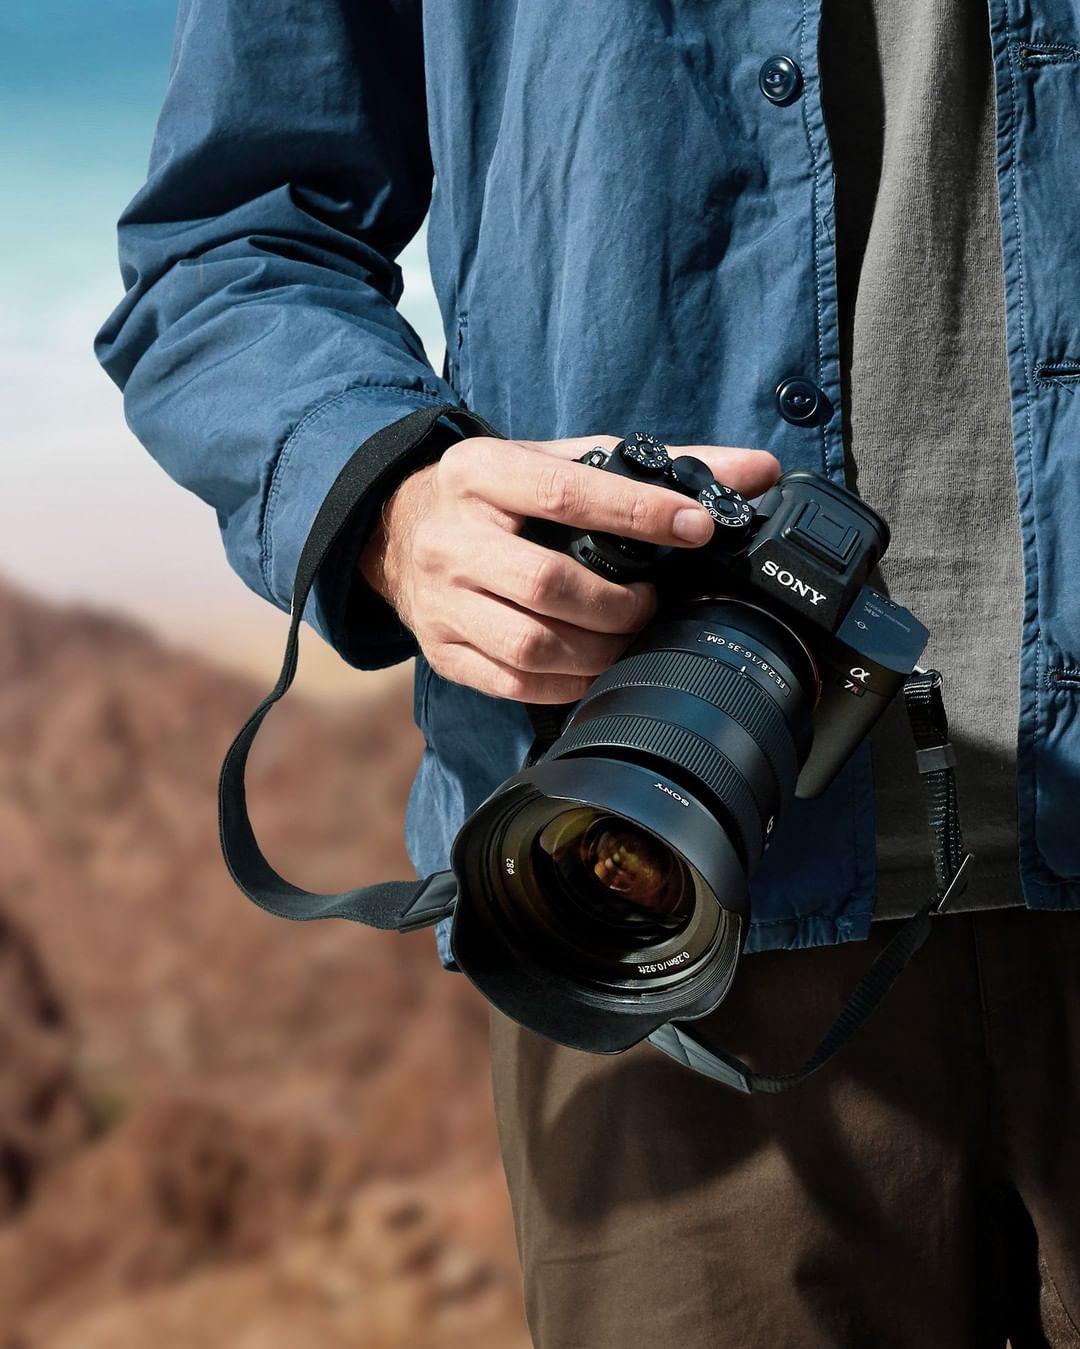 man holding sony dslr camera